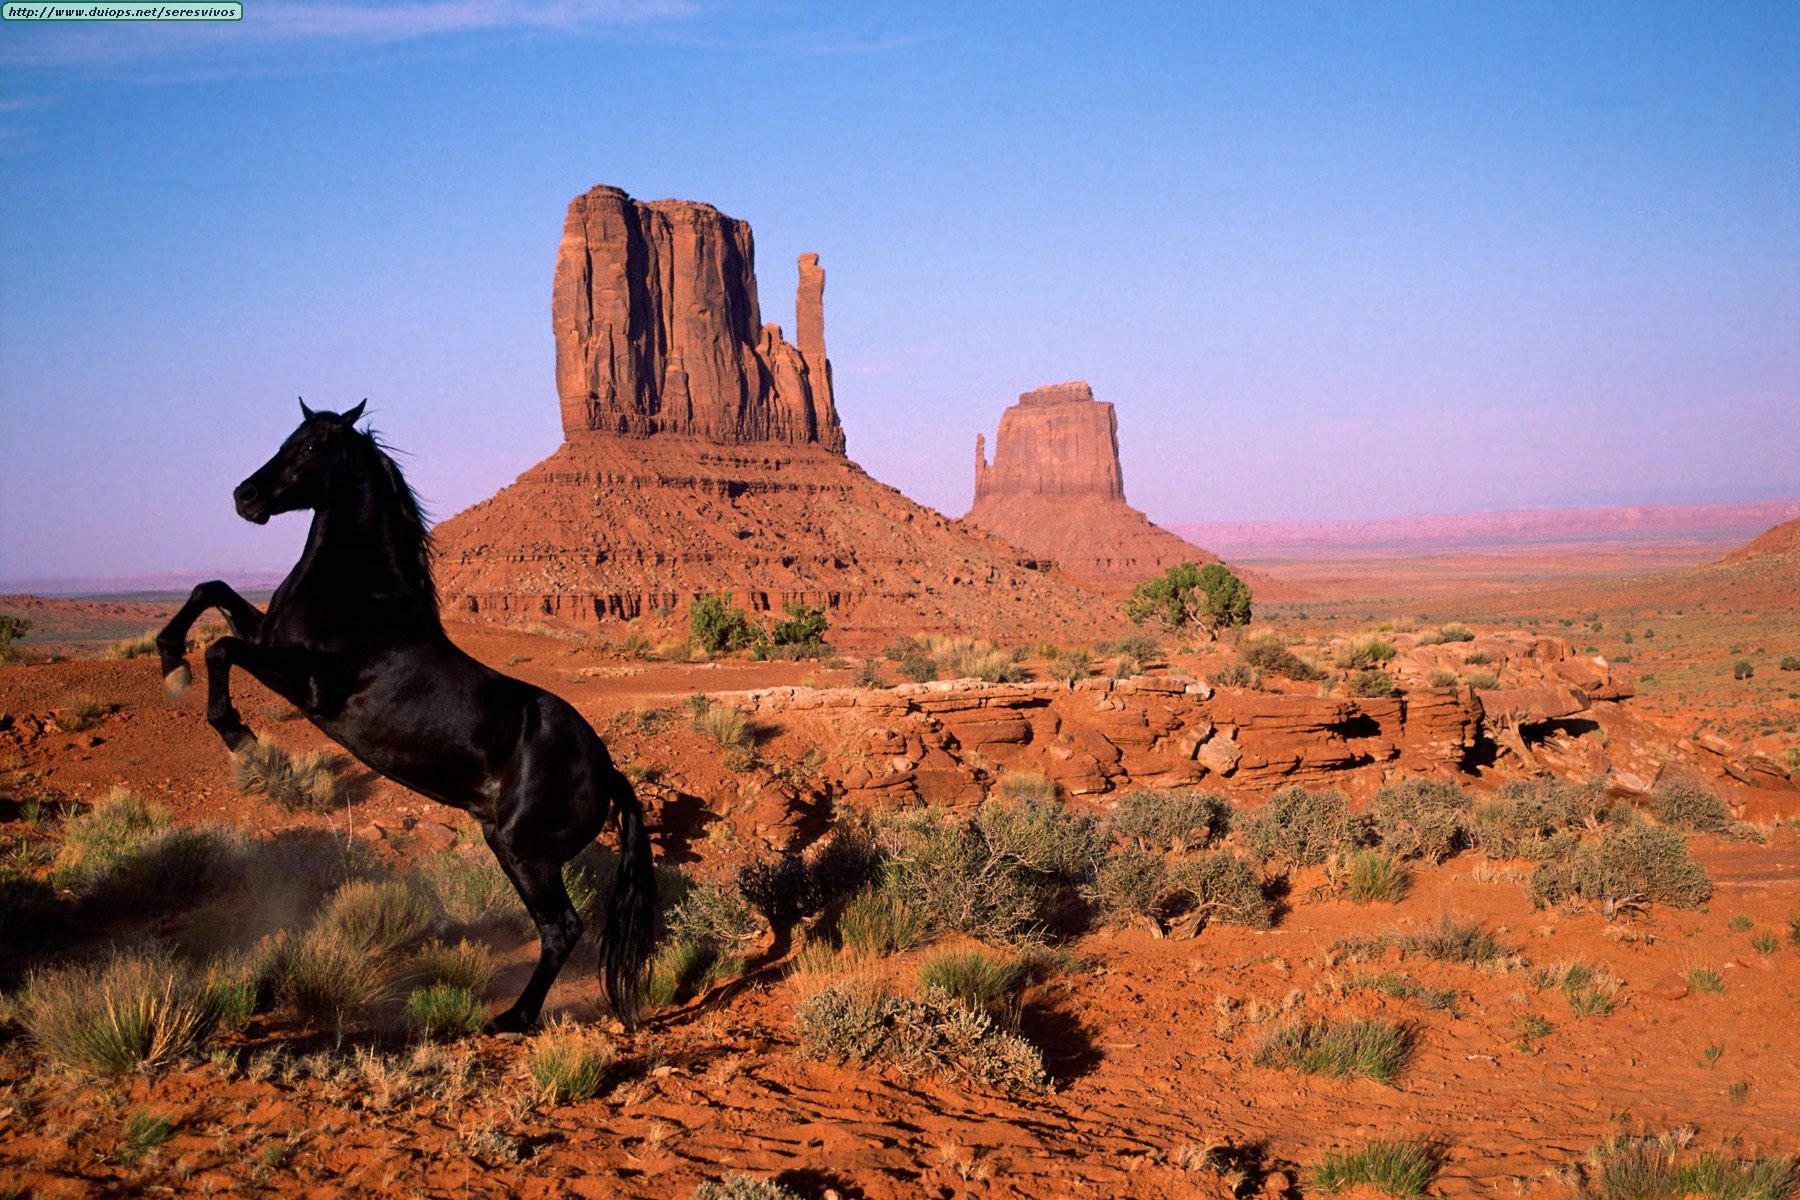 http://www.duiops.net/seresvivos/galeria/caballos/Animals%20Horses_Graceful%20Power,%20Monument%20Valley,%20Utah.jpg